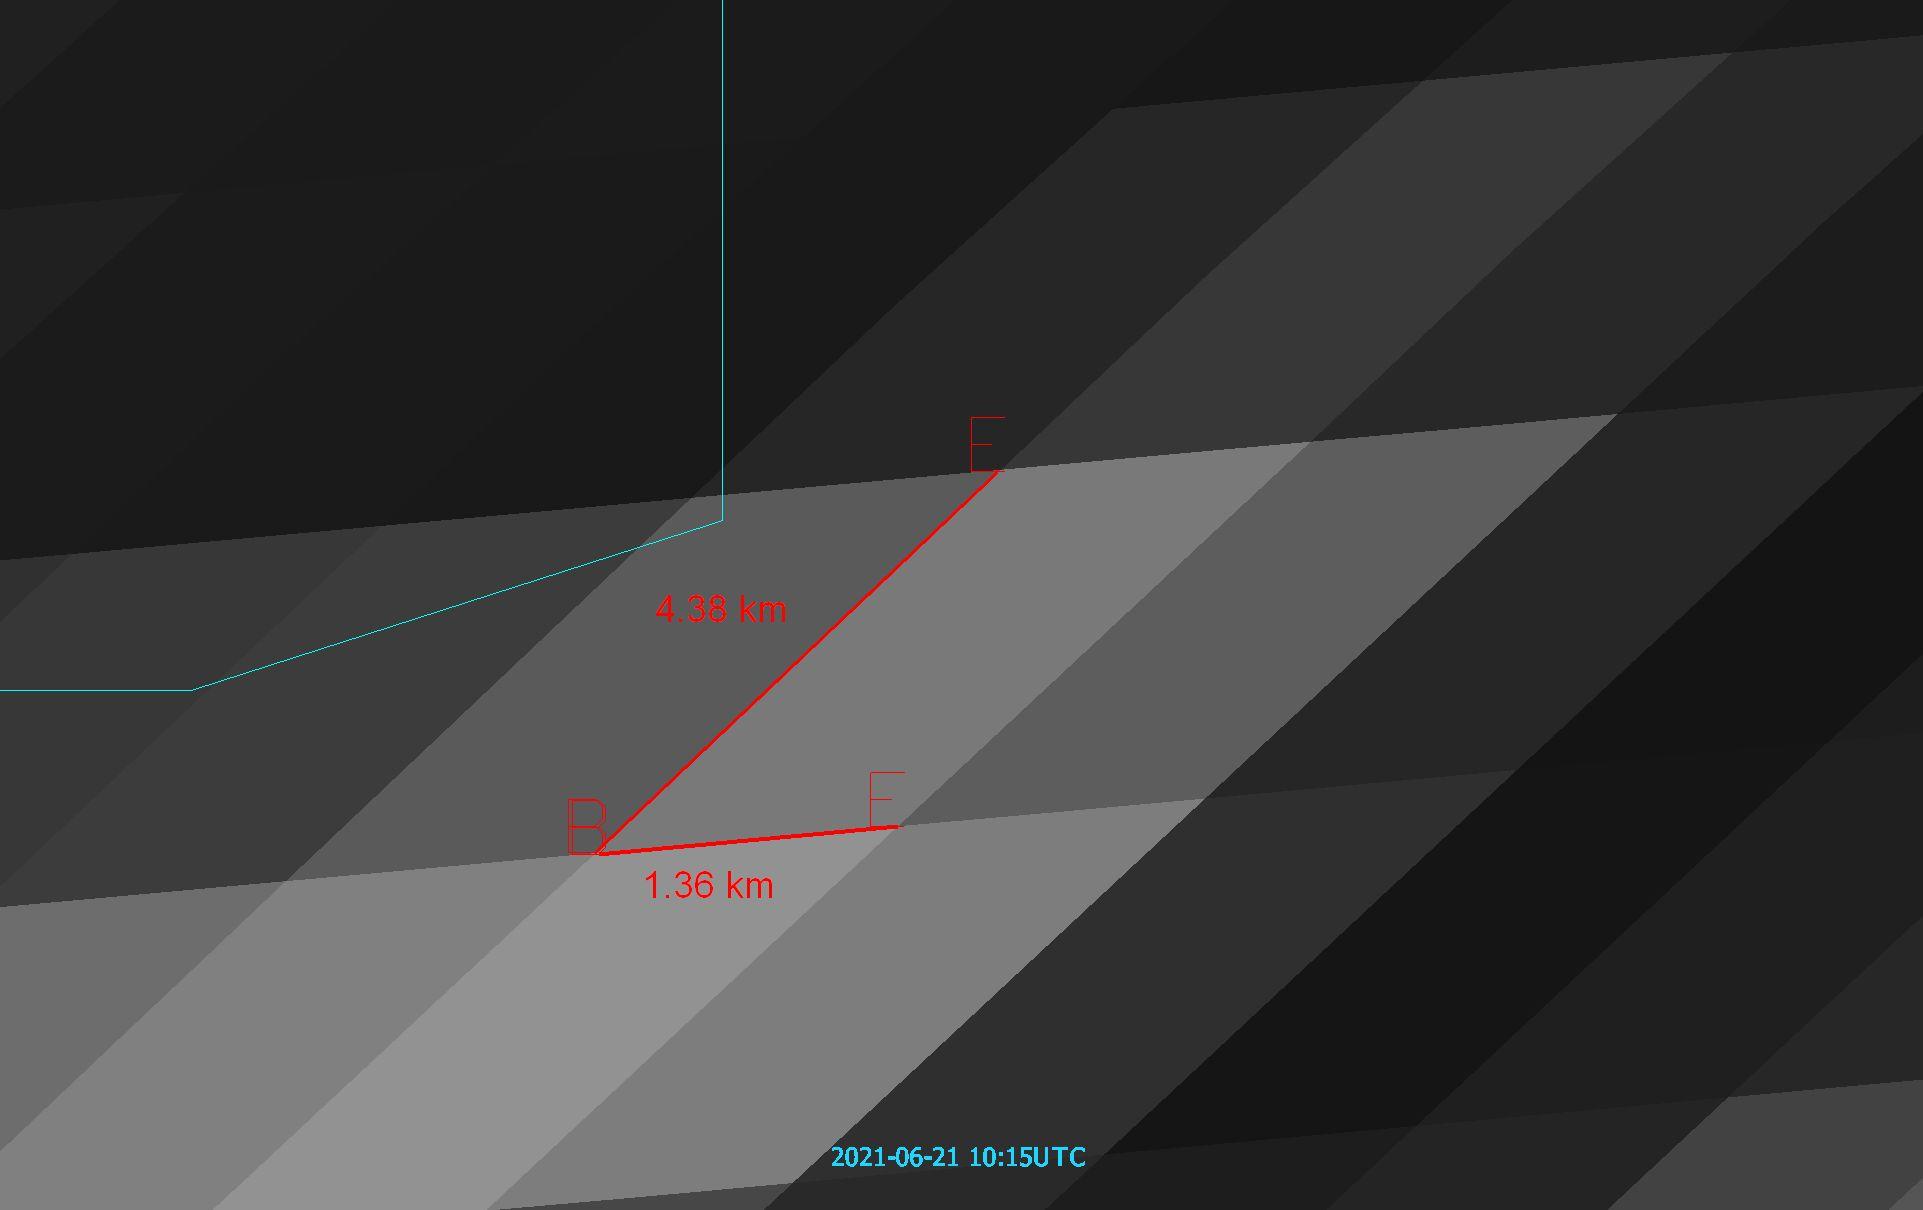 HRV pixel size